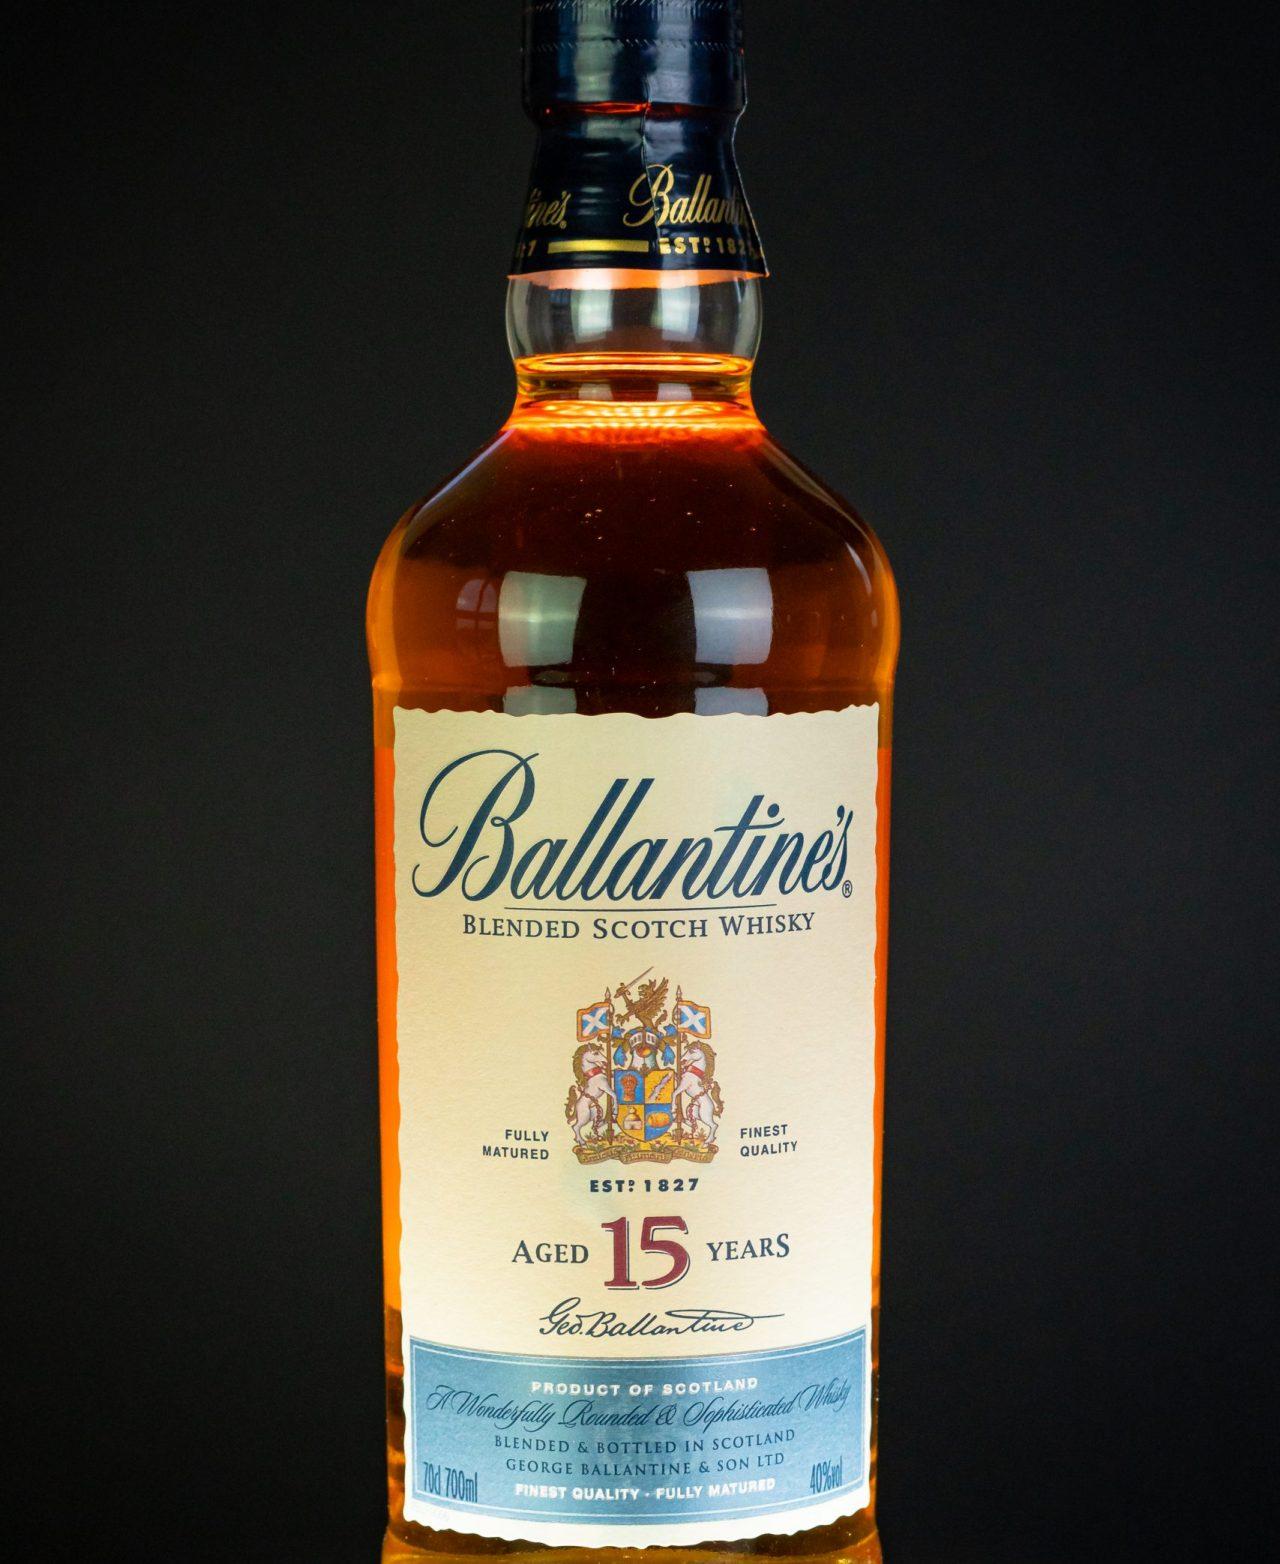 Ballantine's Blended Scotch Whiskey